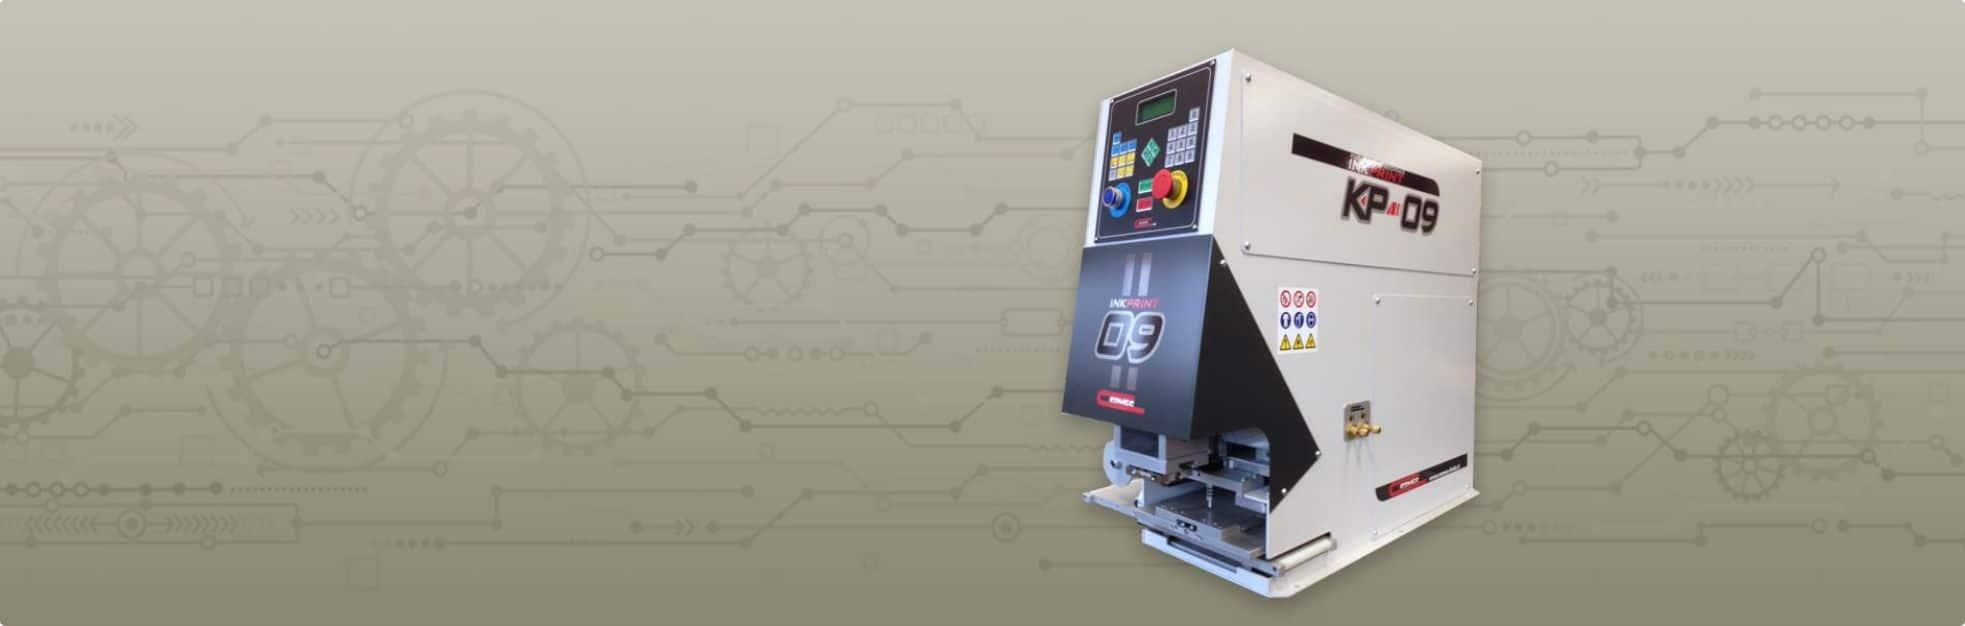 KP09 Pad Printing Machine